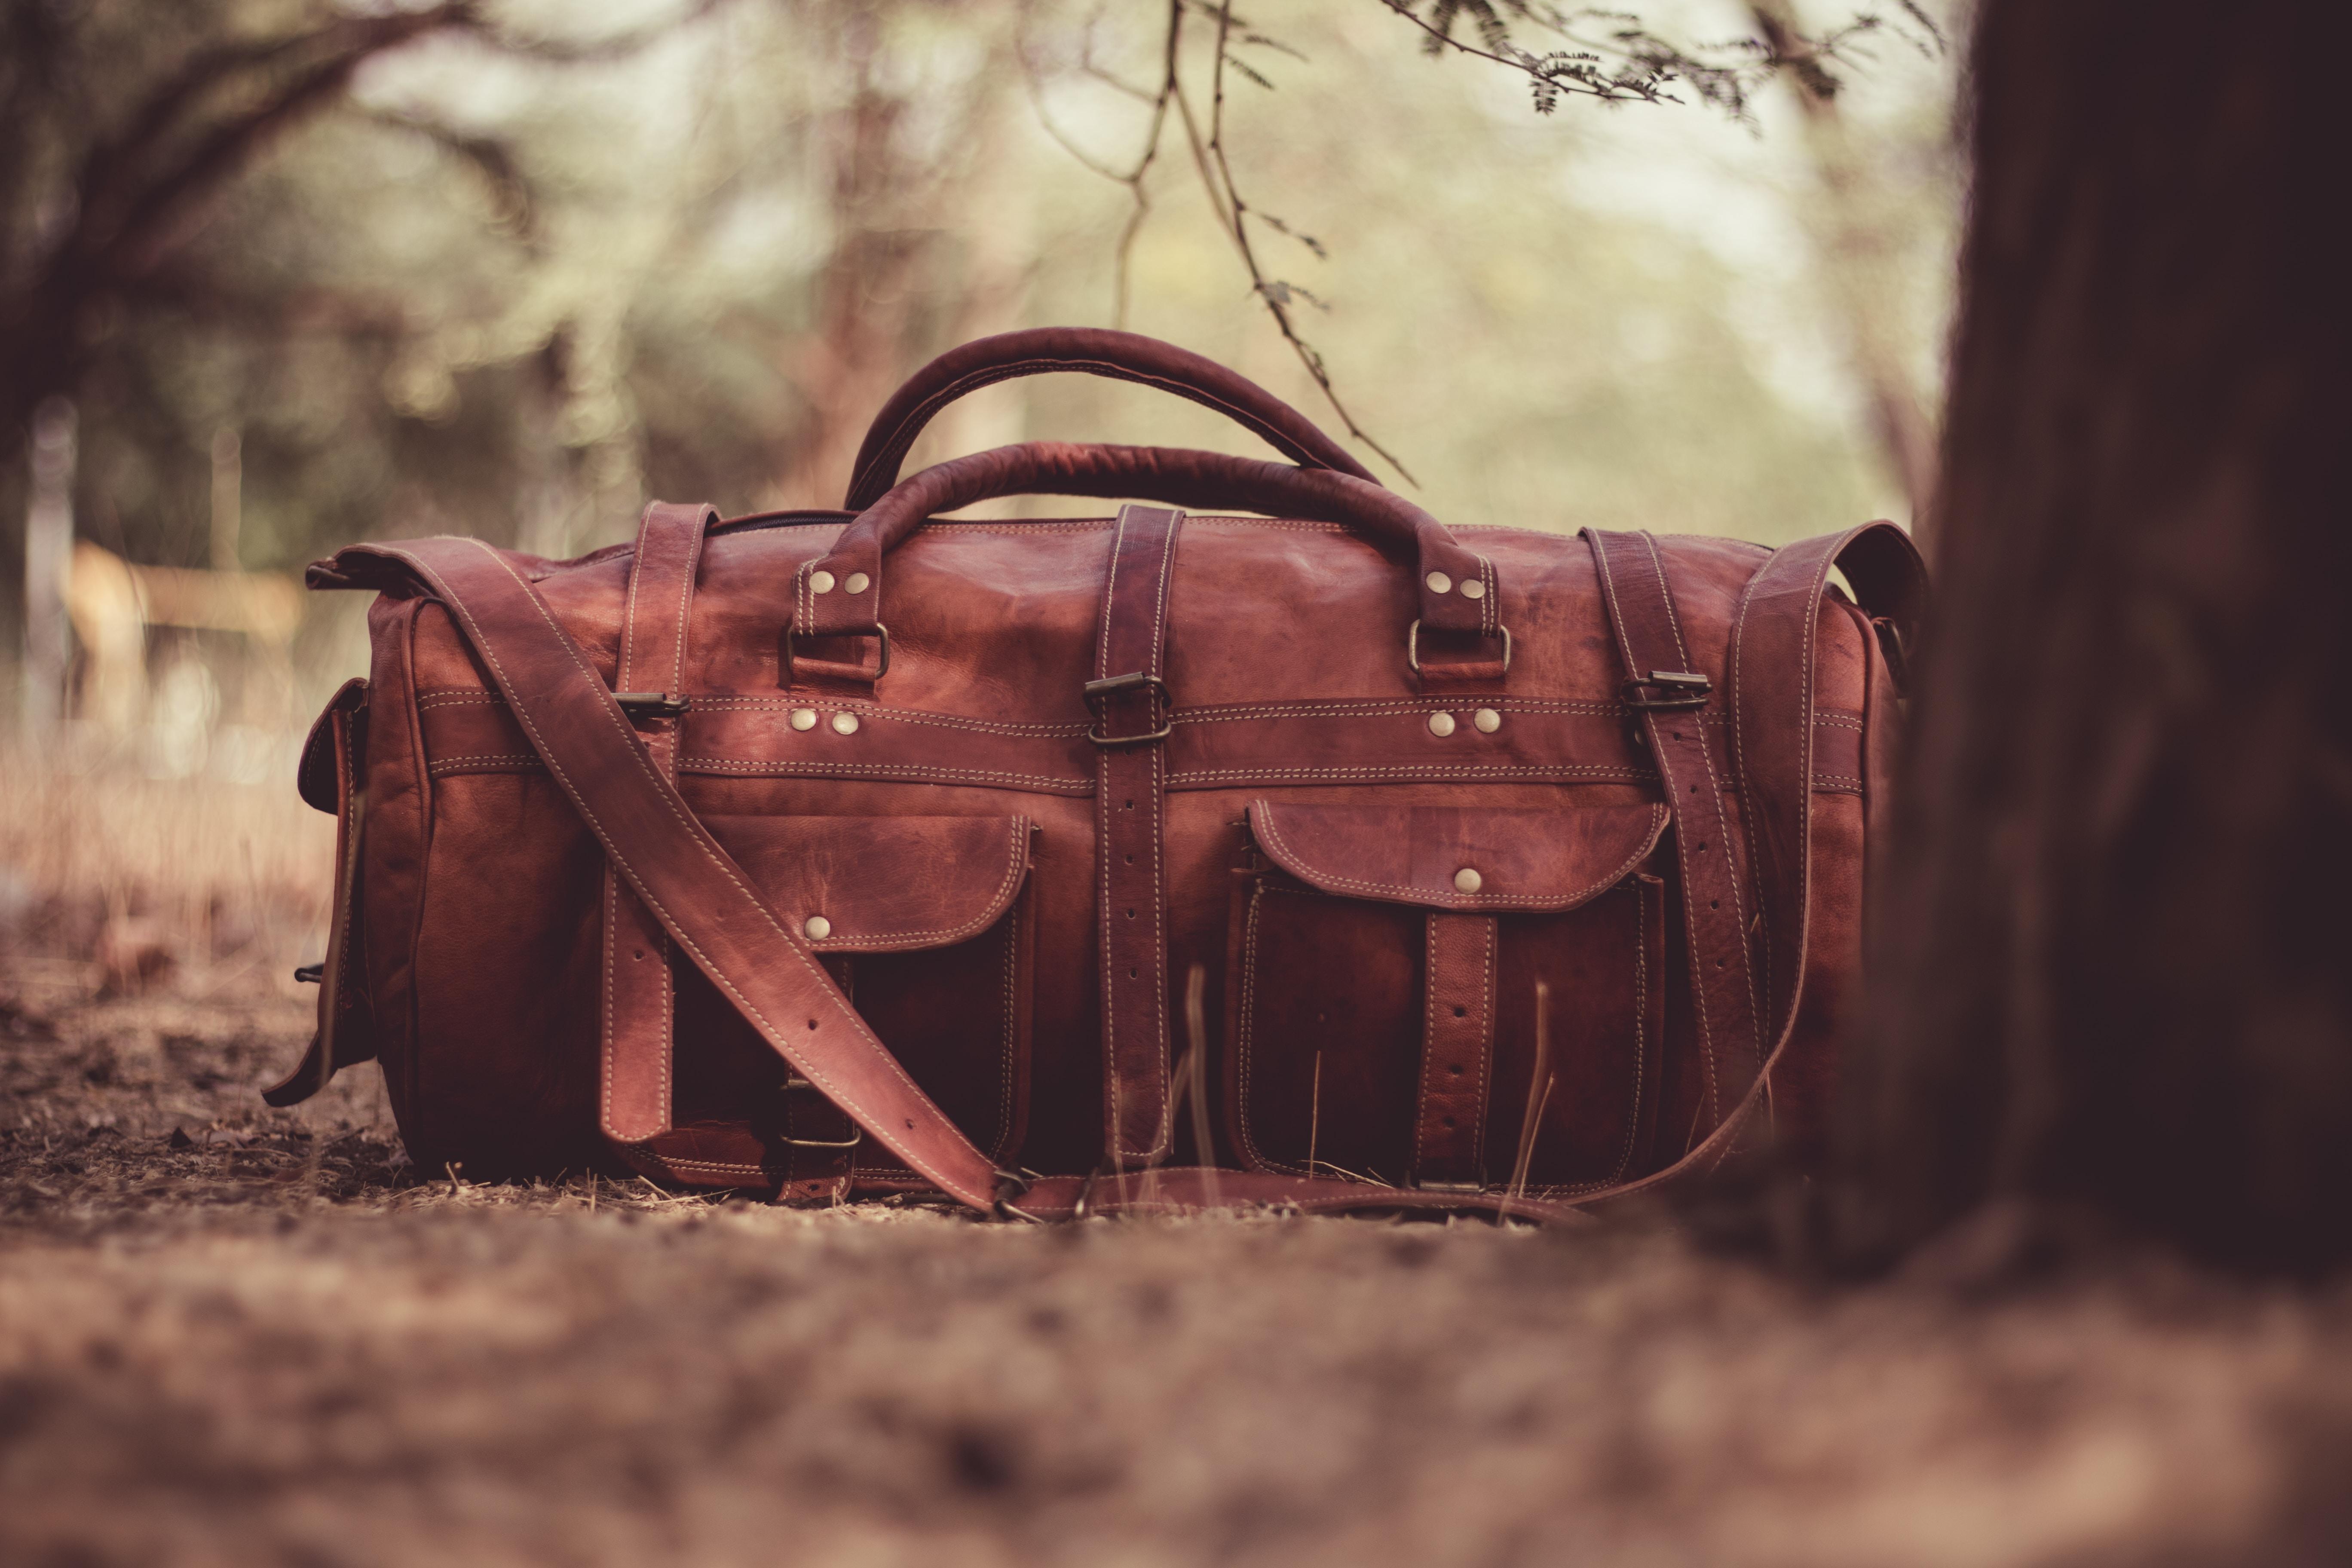 selective focus photography brown leather 2-way handbag near tree